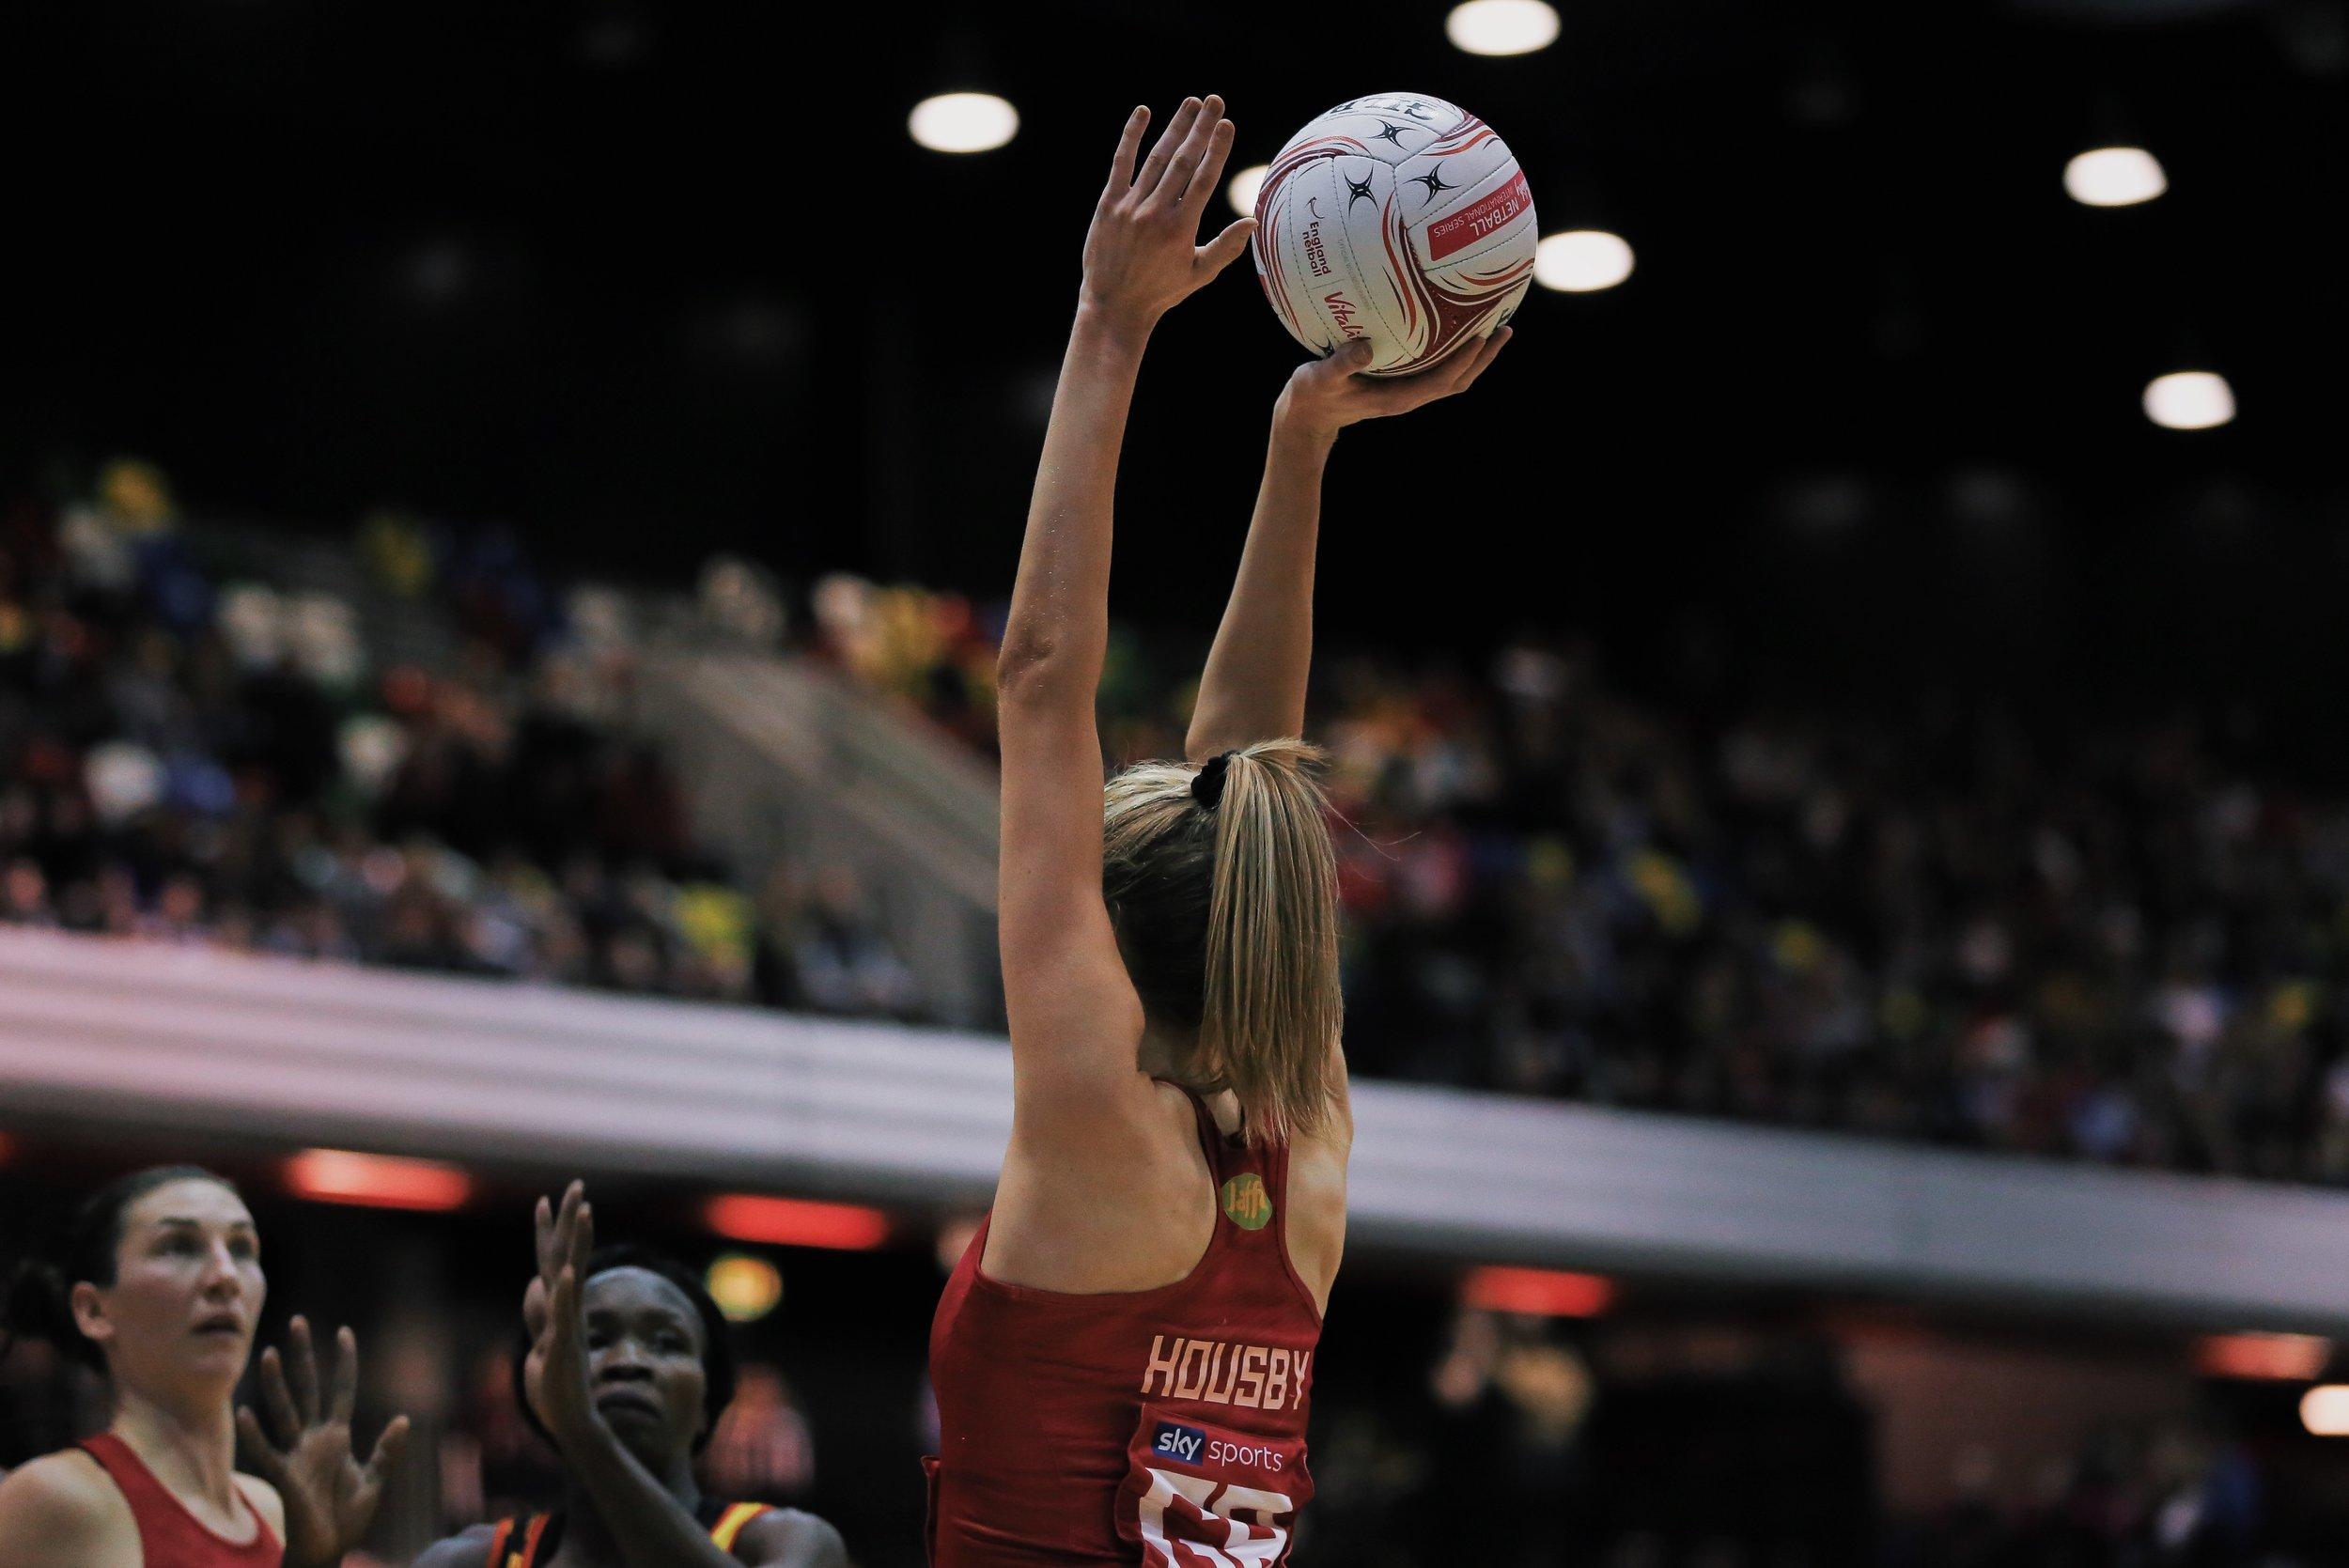 womens-netball-sport-england-uganda-international-series-05.jpg